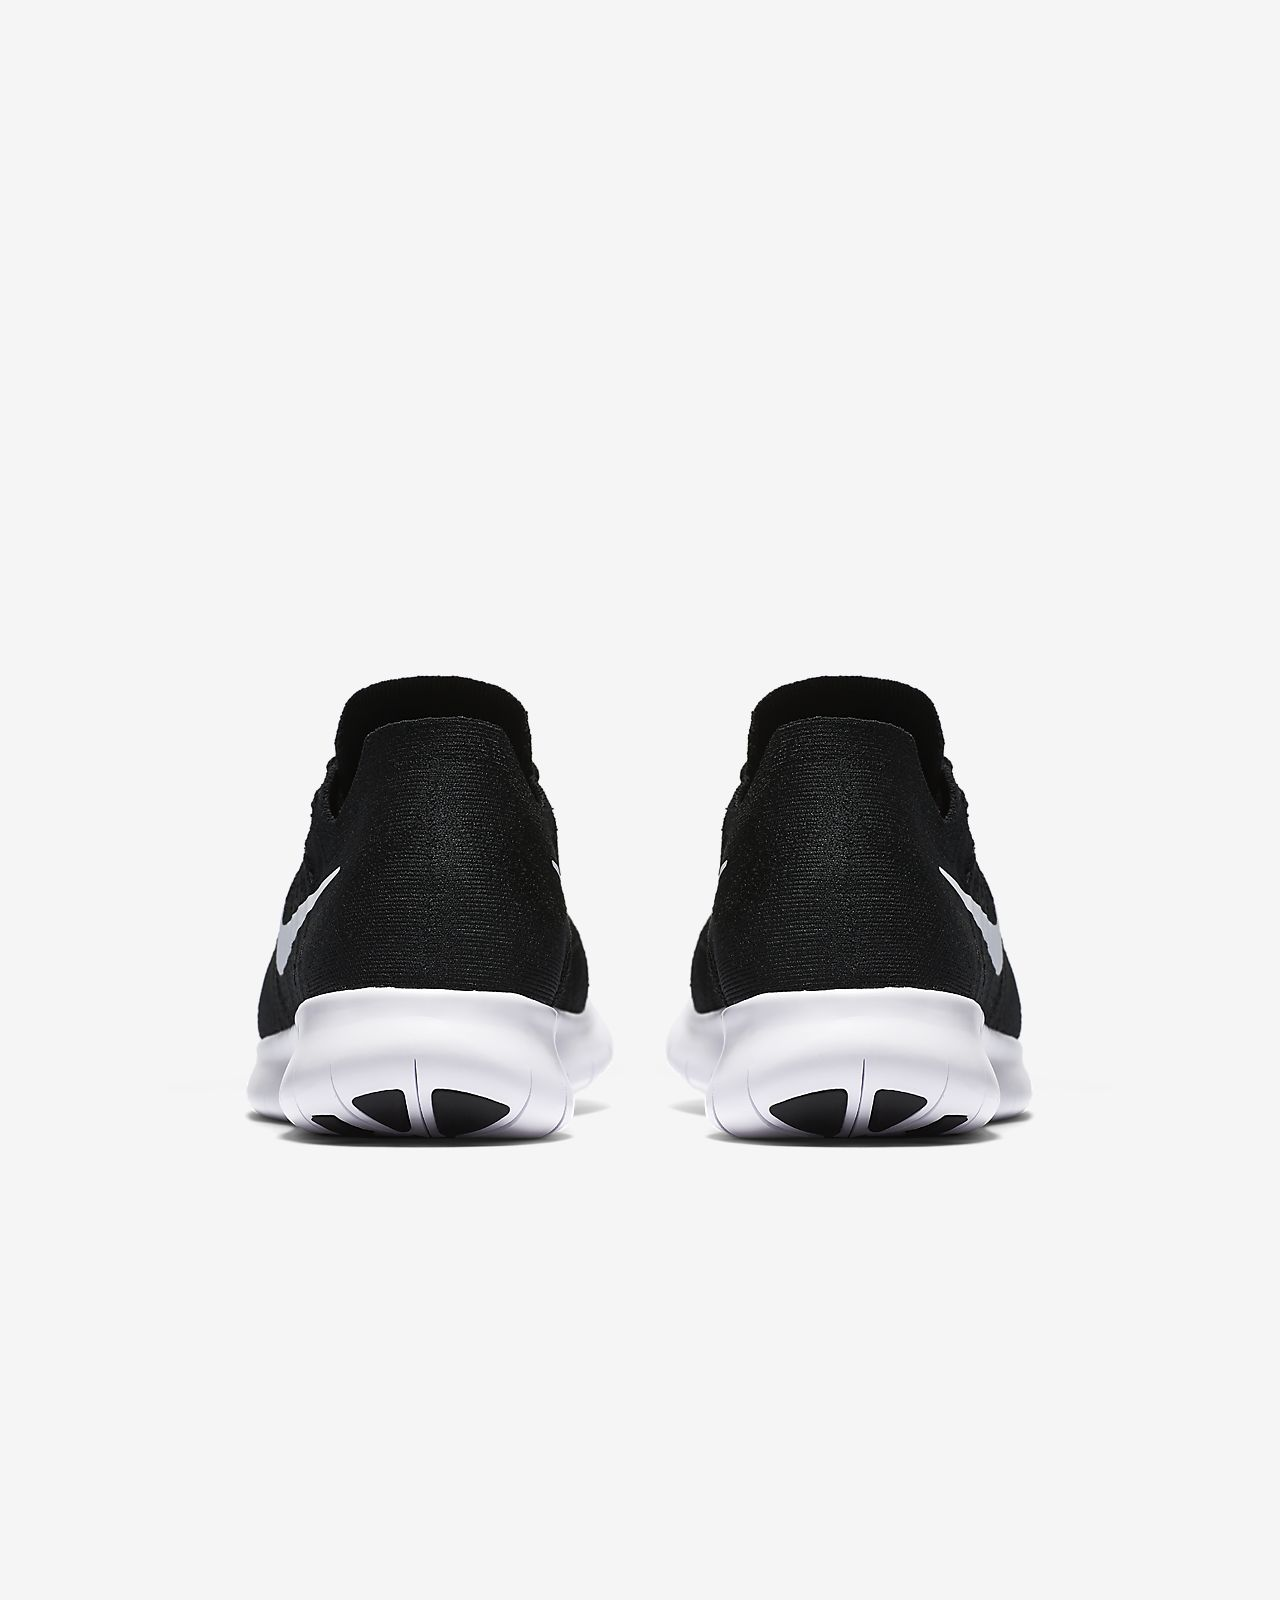 Rn HommeBe Nike Chaussure Free Running De Flyknit 2017 Pour K1FlJc